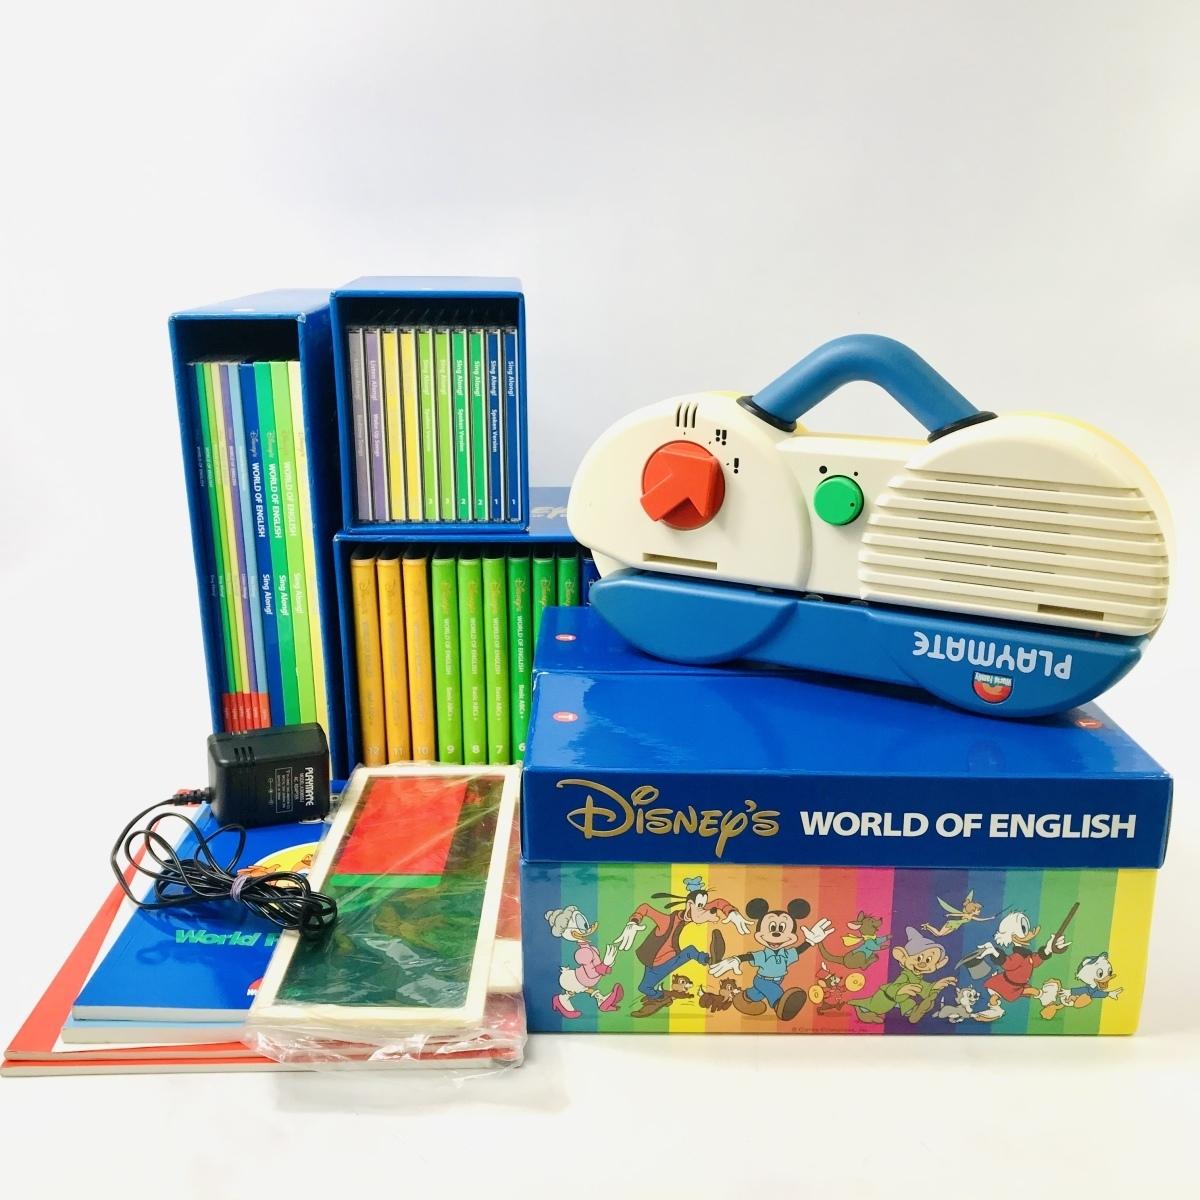 Disney World English DWE ワールド イングリッシュ DVD CD PLAYMATE カード 等 セット_画像1